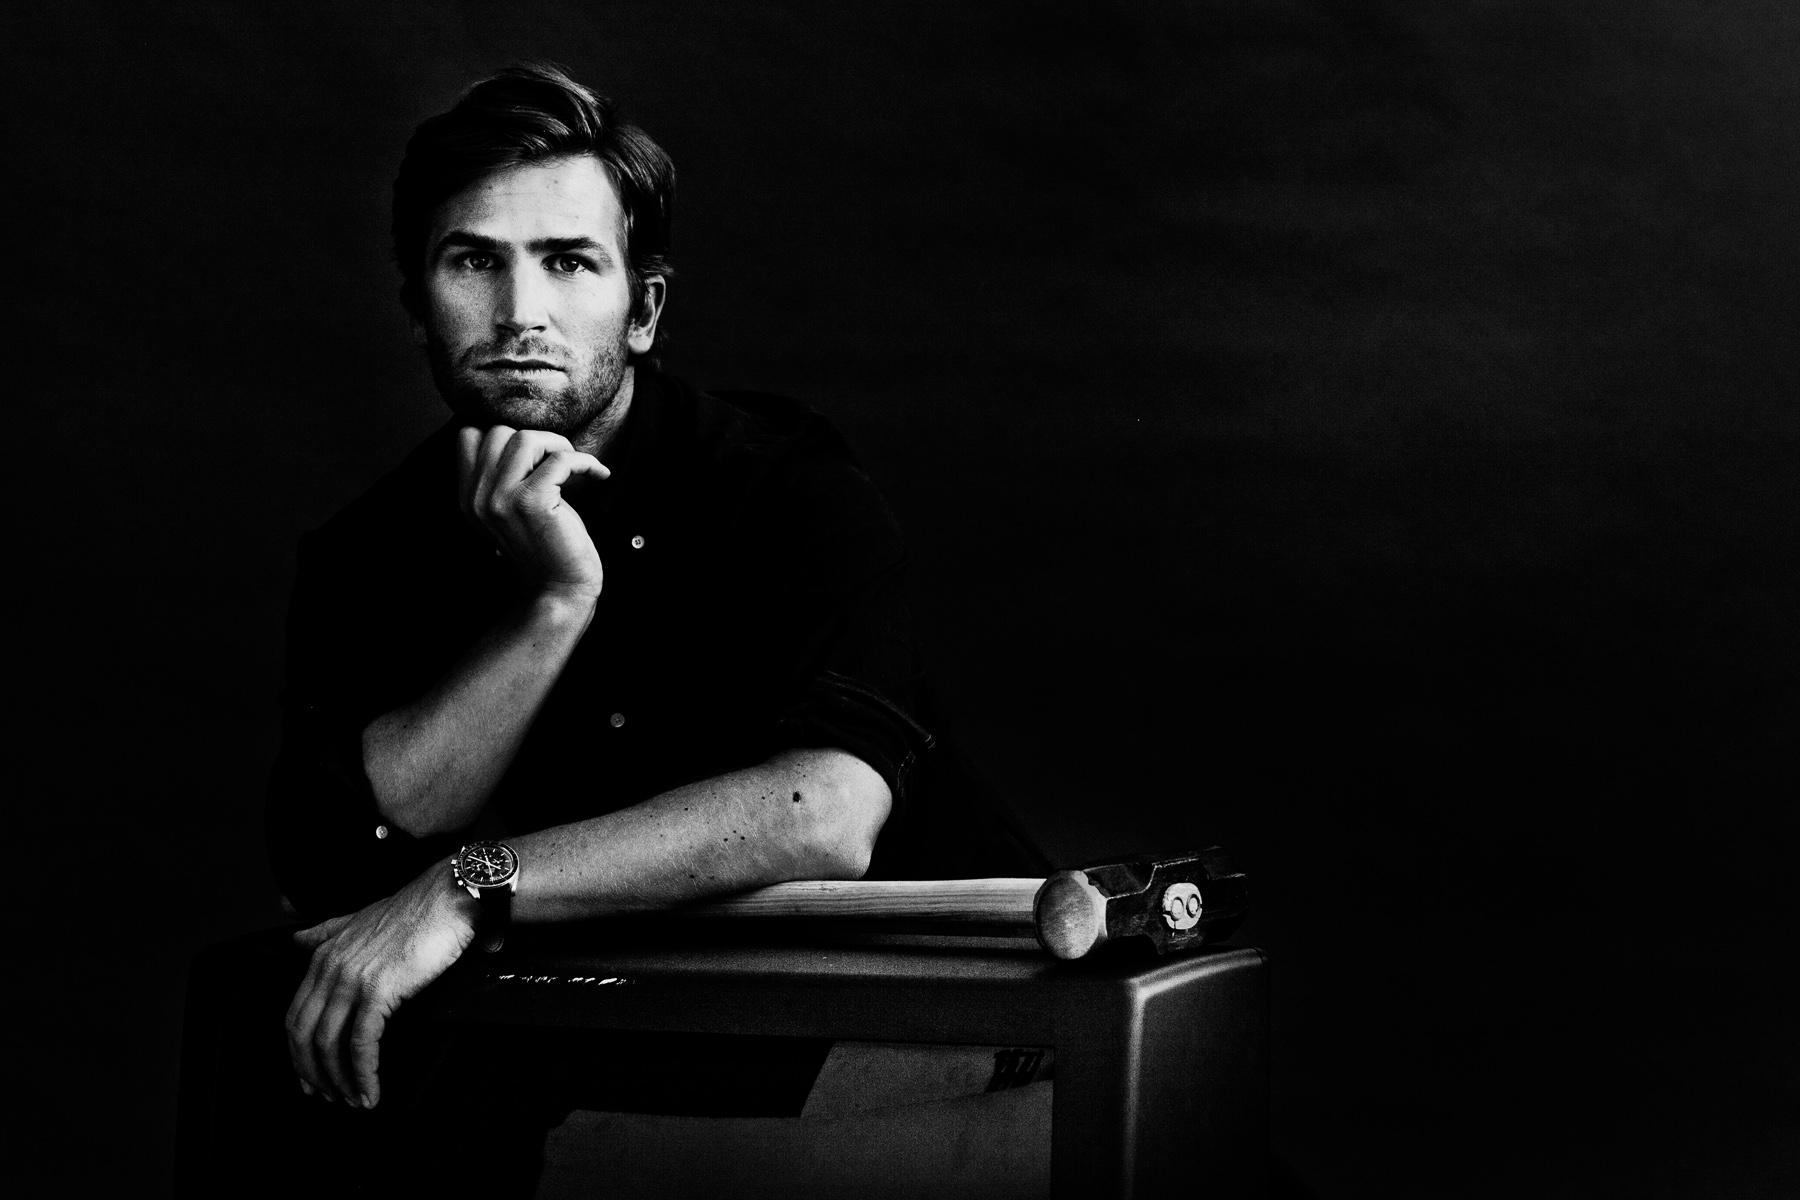 Fotograf Christian Gustavsson